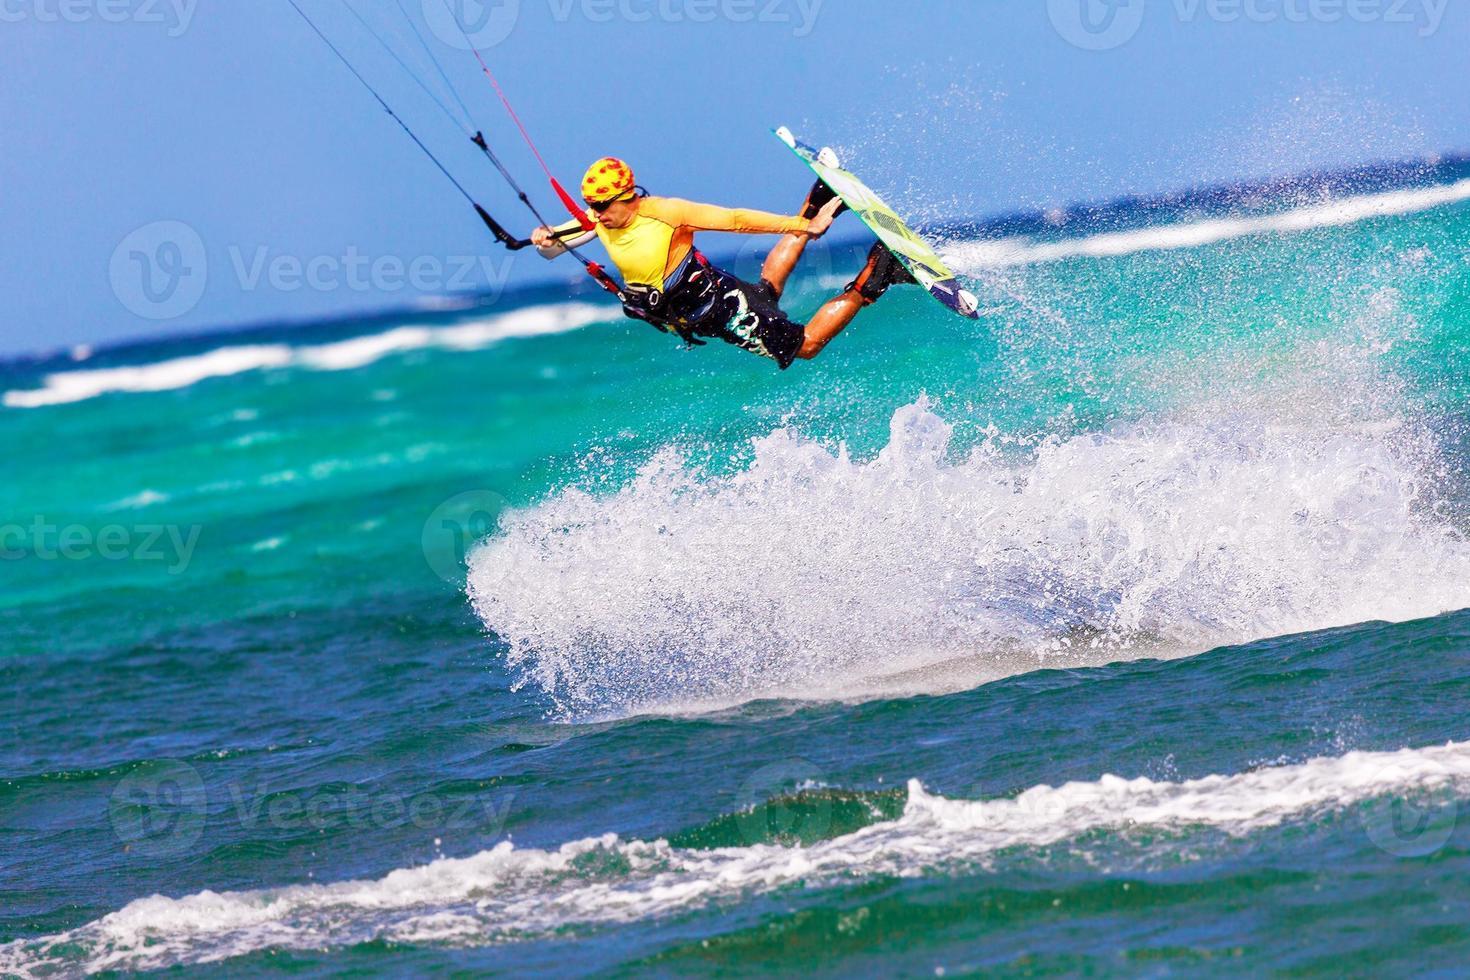 kitesurfer di salto sul fondo del mare sport estremo kitesurf foto